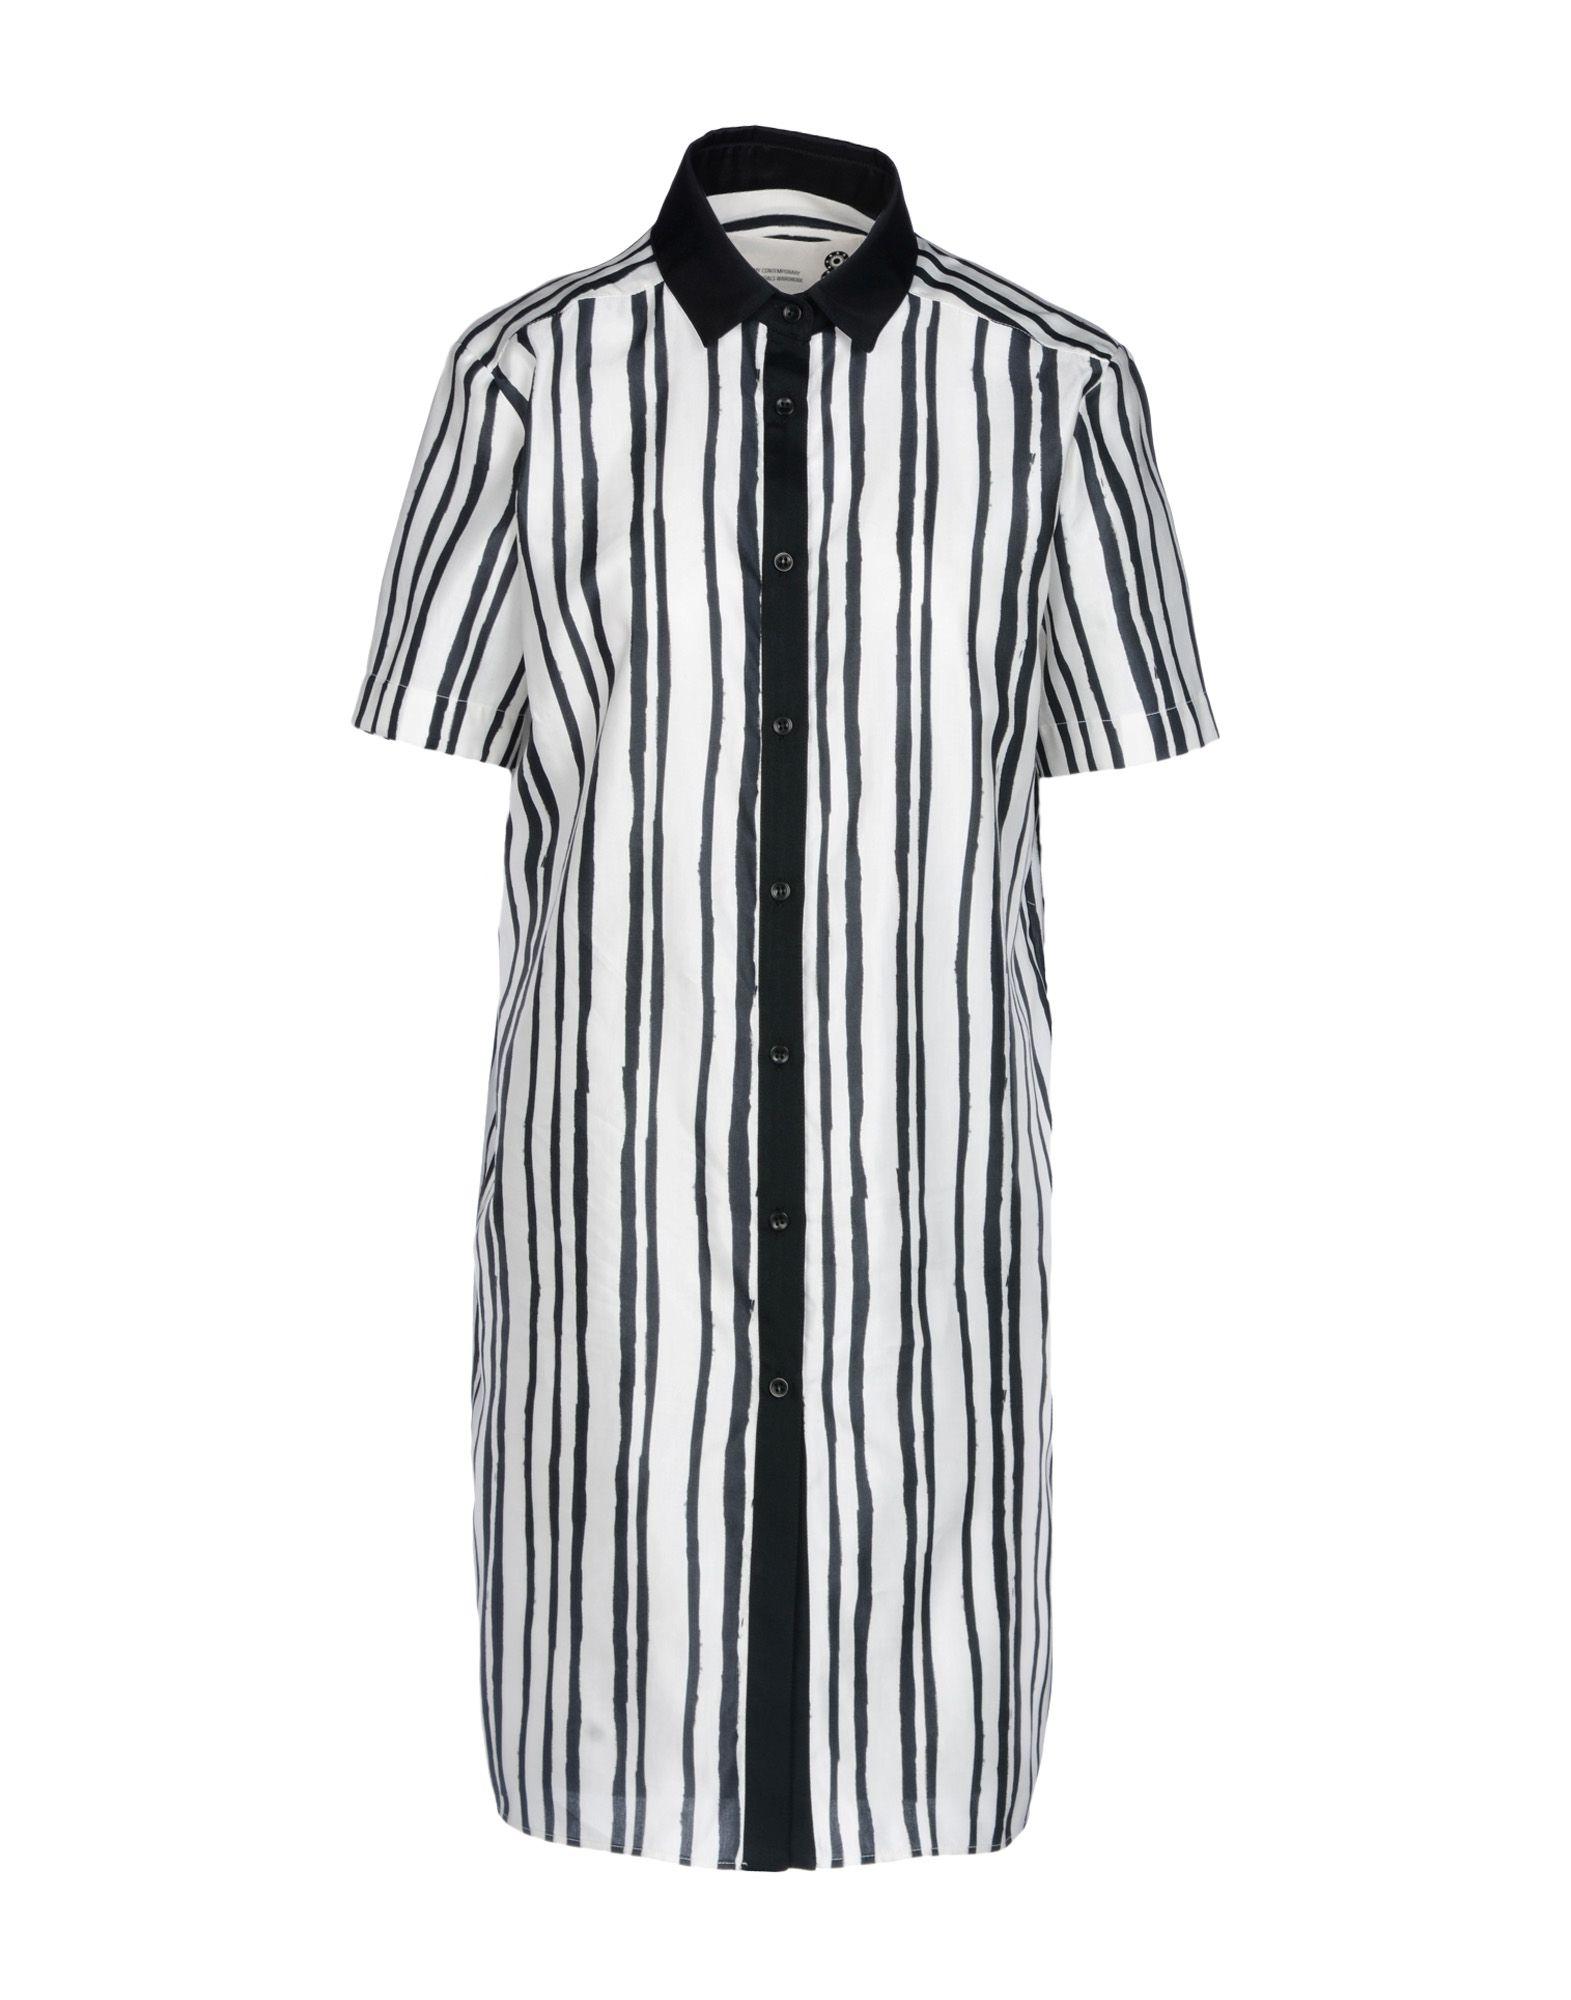 8 Короткое платье короткое платье